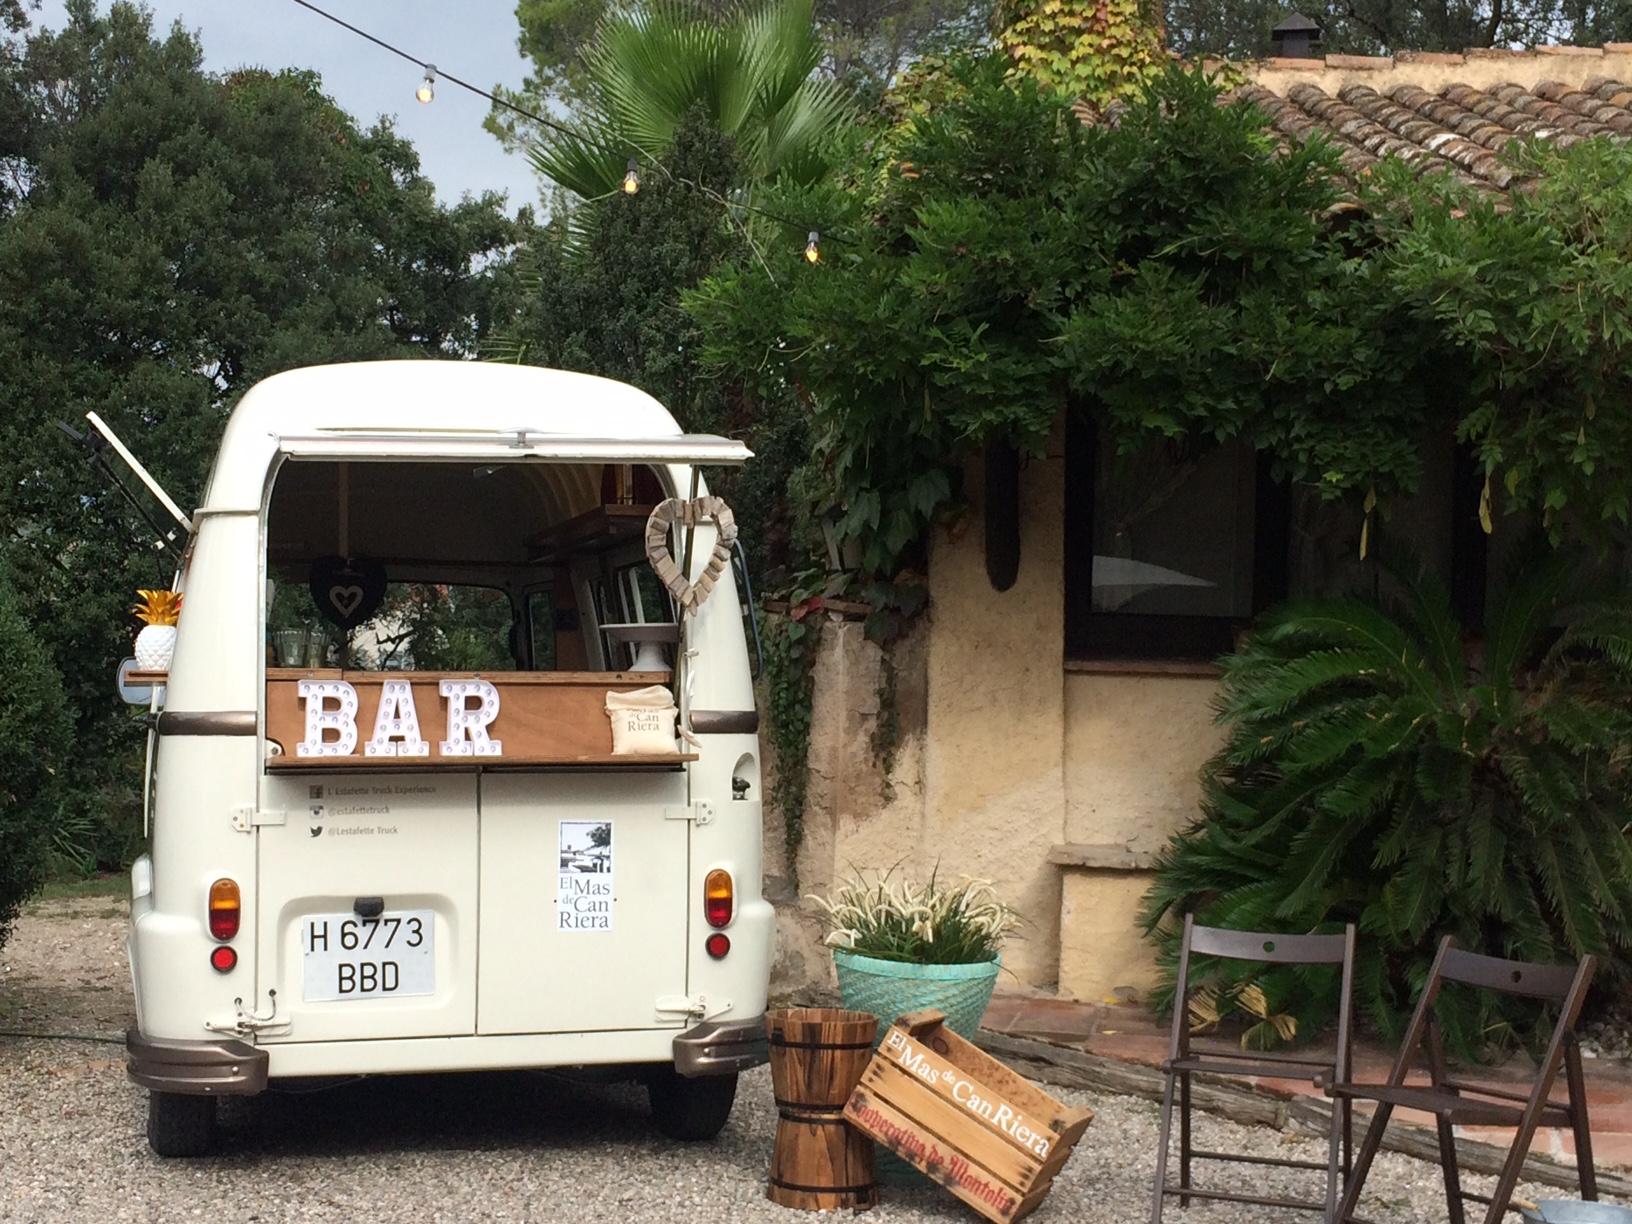 FoodTruck Experience Barcelona - Mas de Can Riera